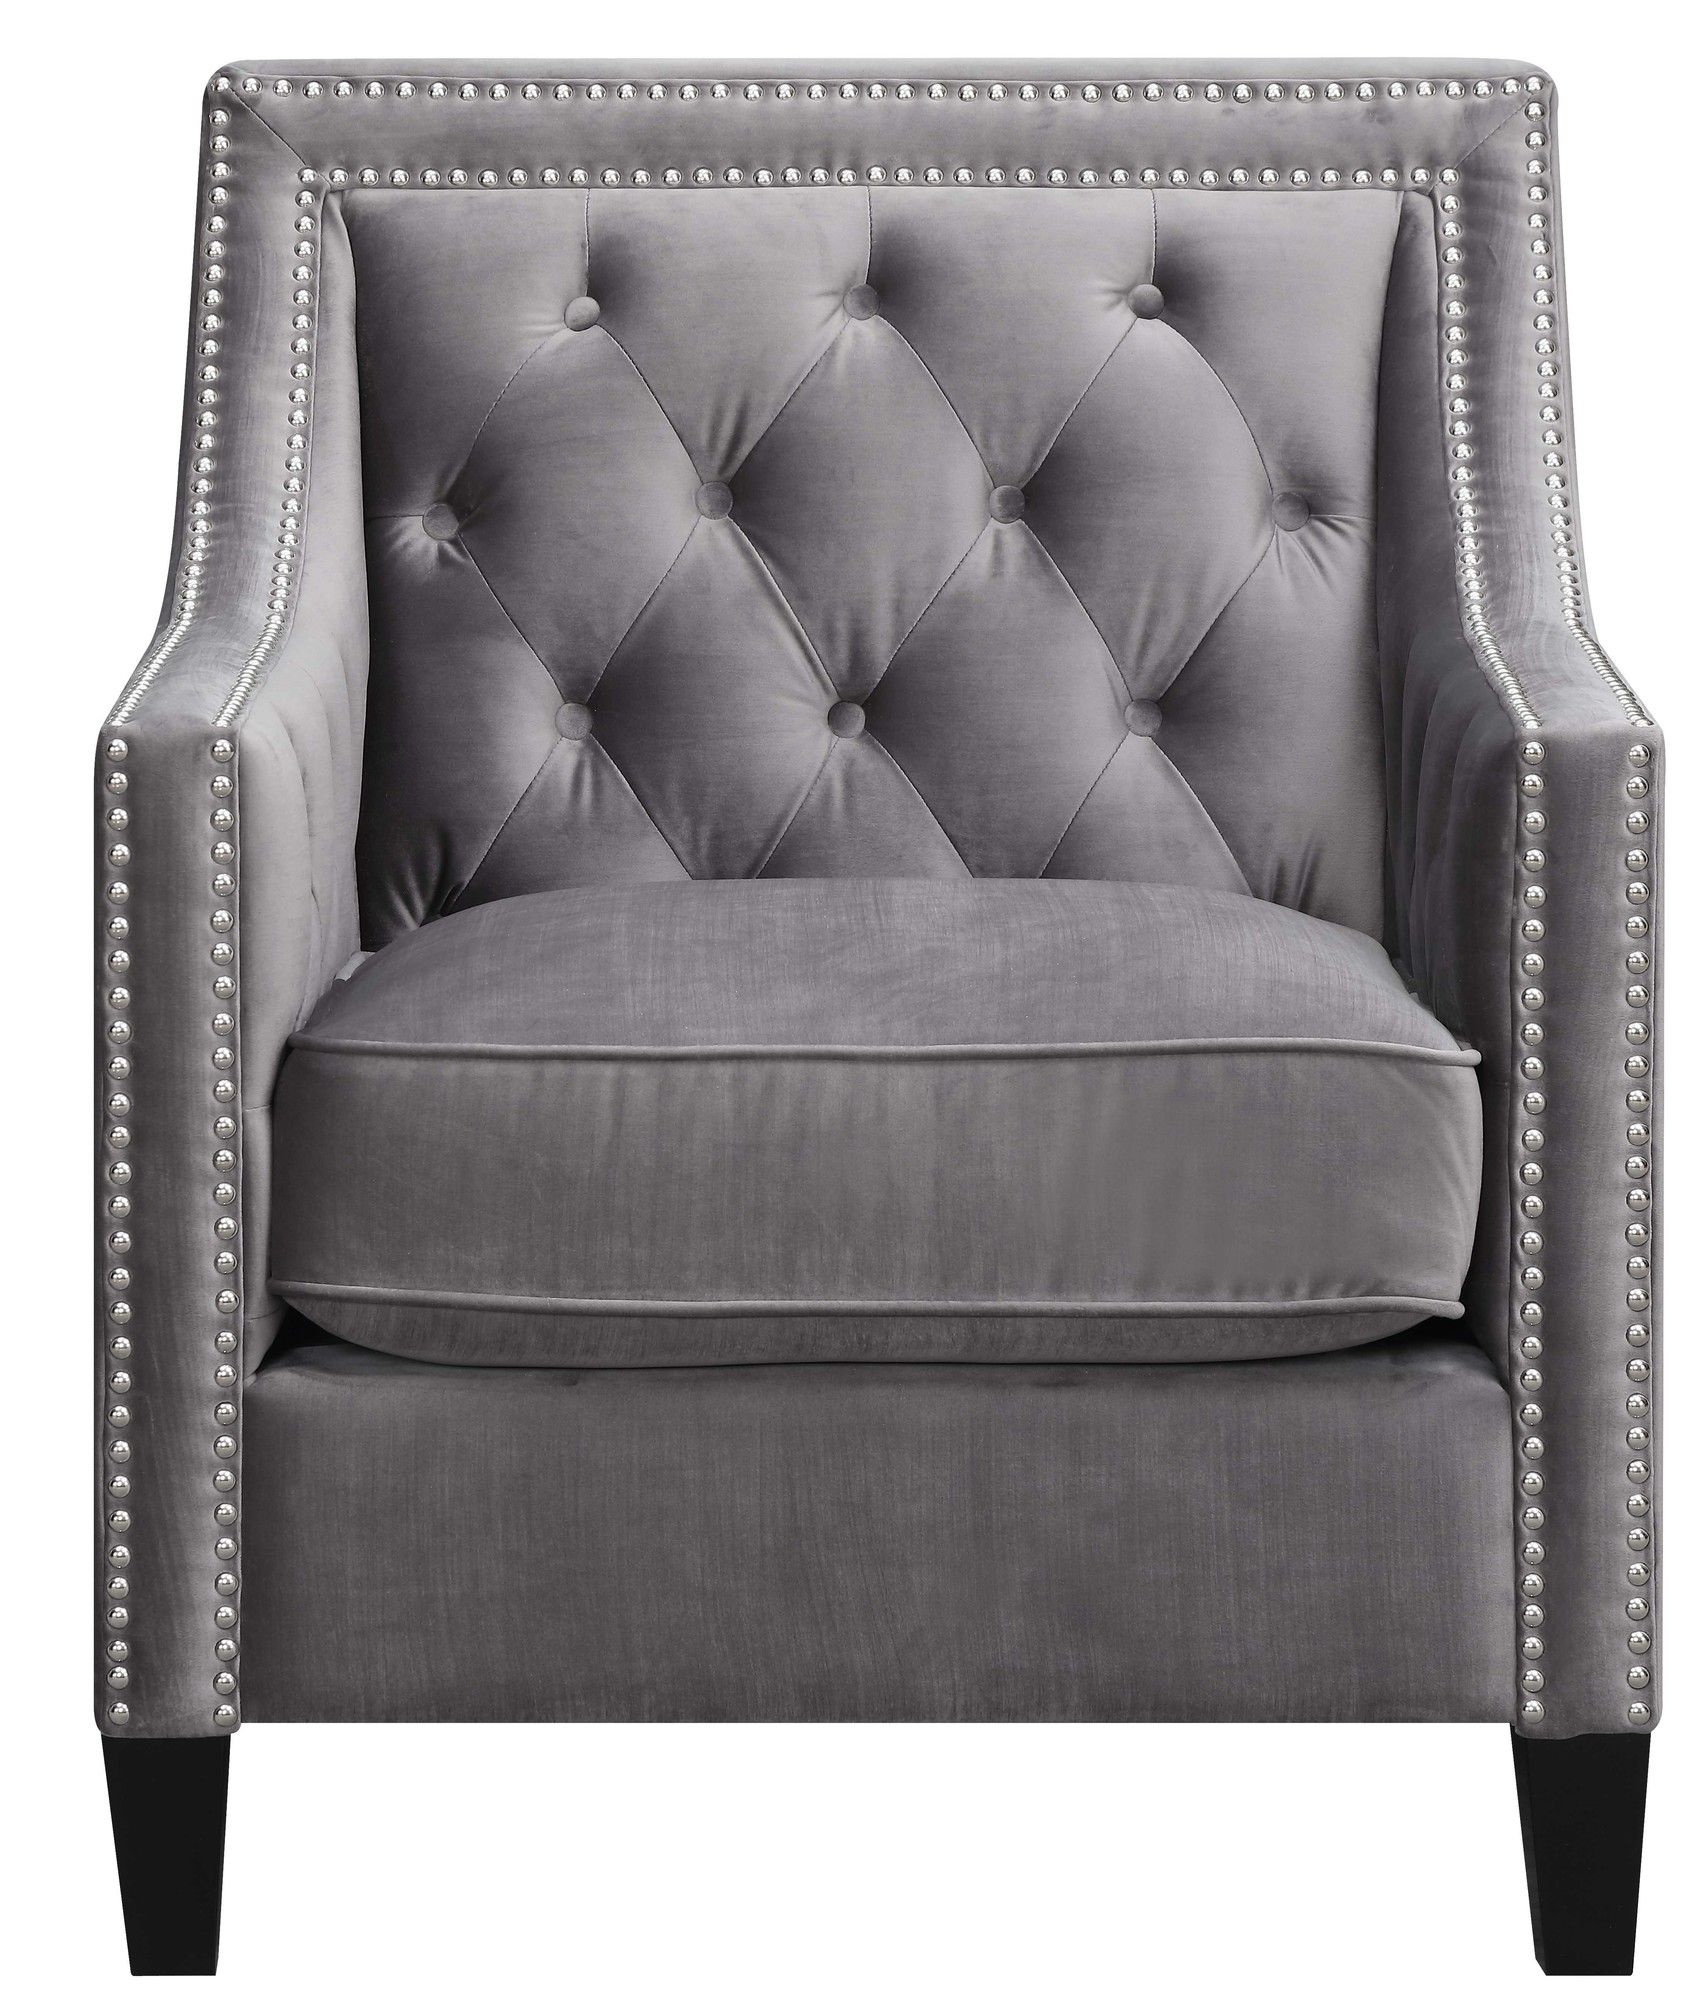 Outstanding Kamron Armchair Backsplash Blue Accent Chairs Accent Machost Co Dining Chair Design Ideas Machostcouk